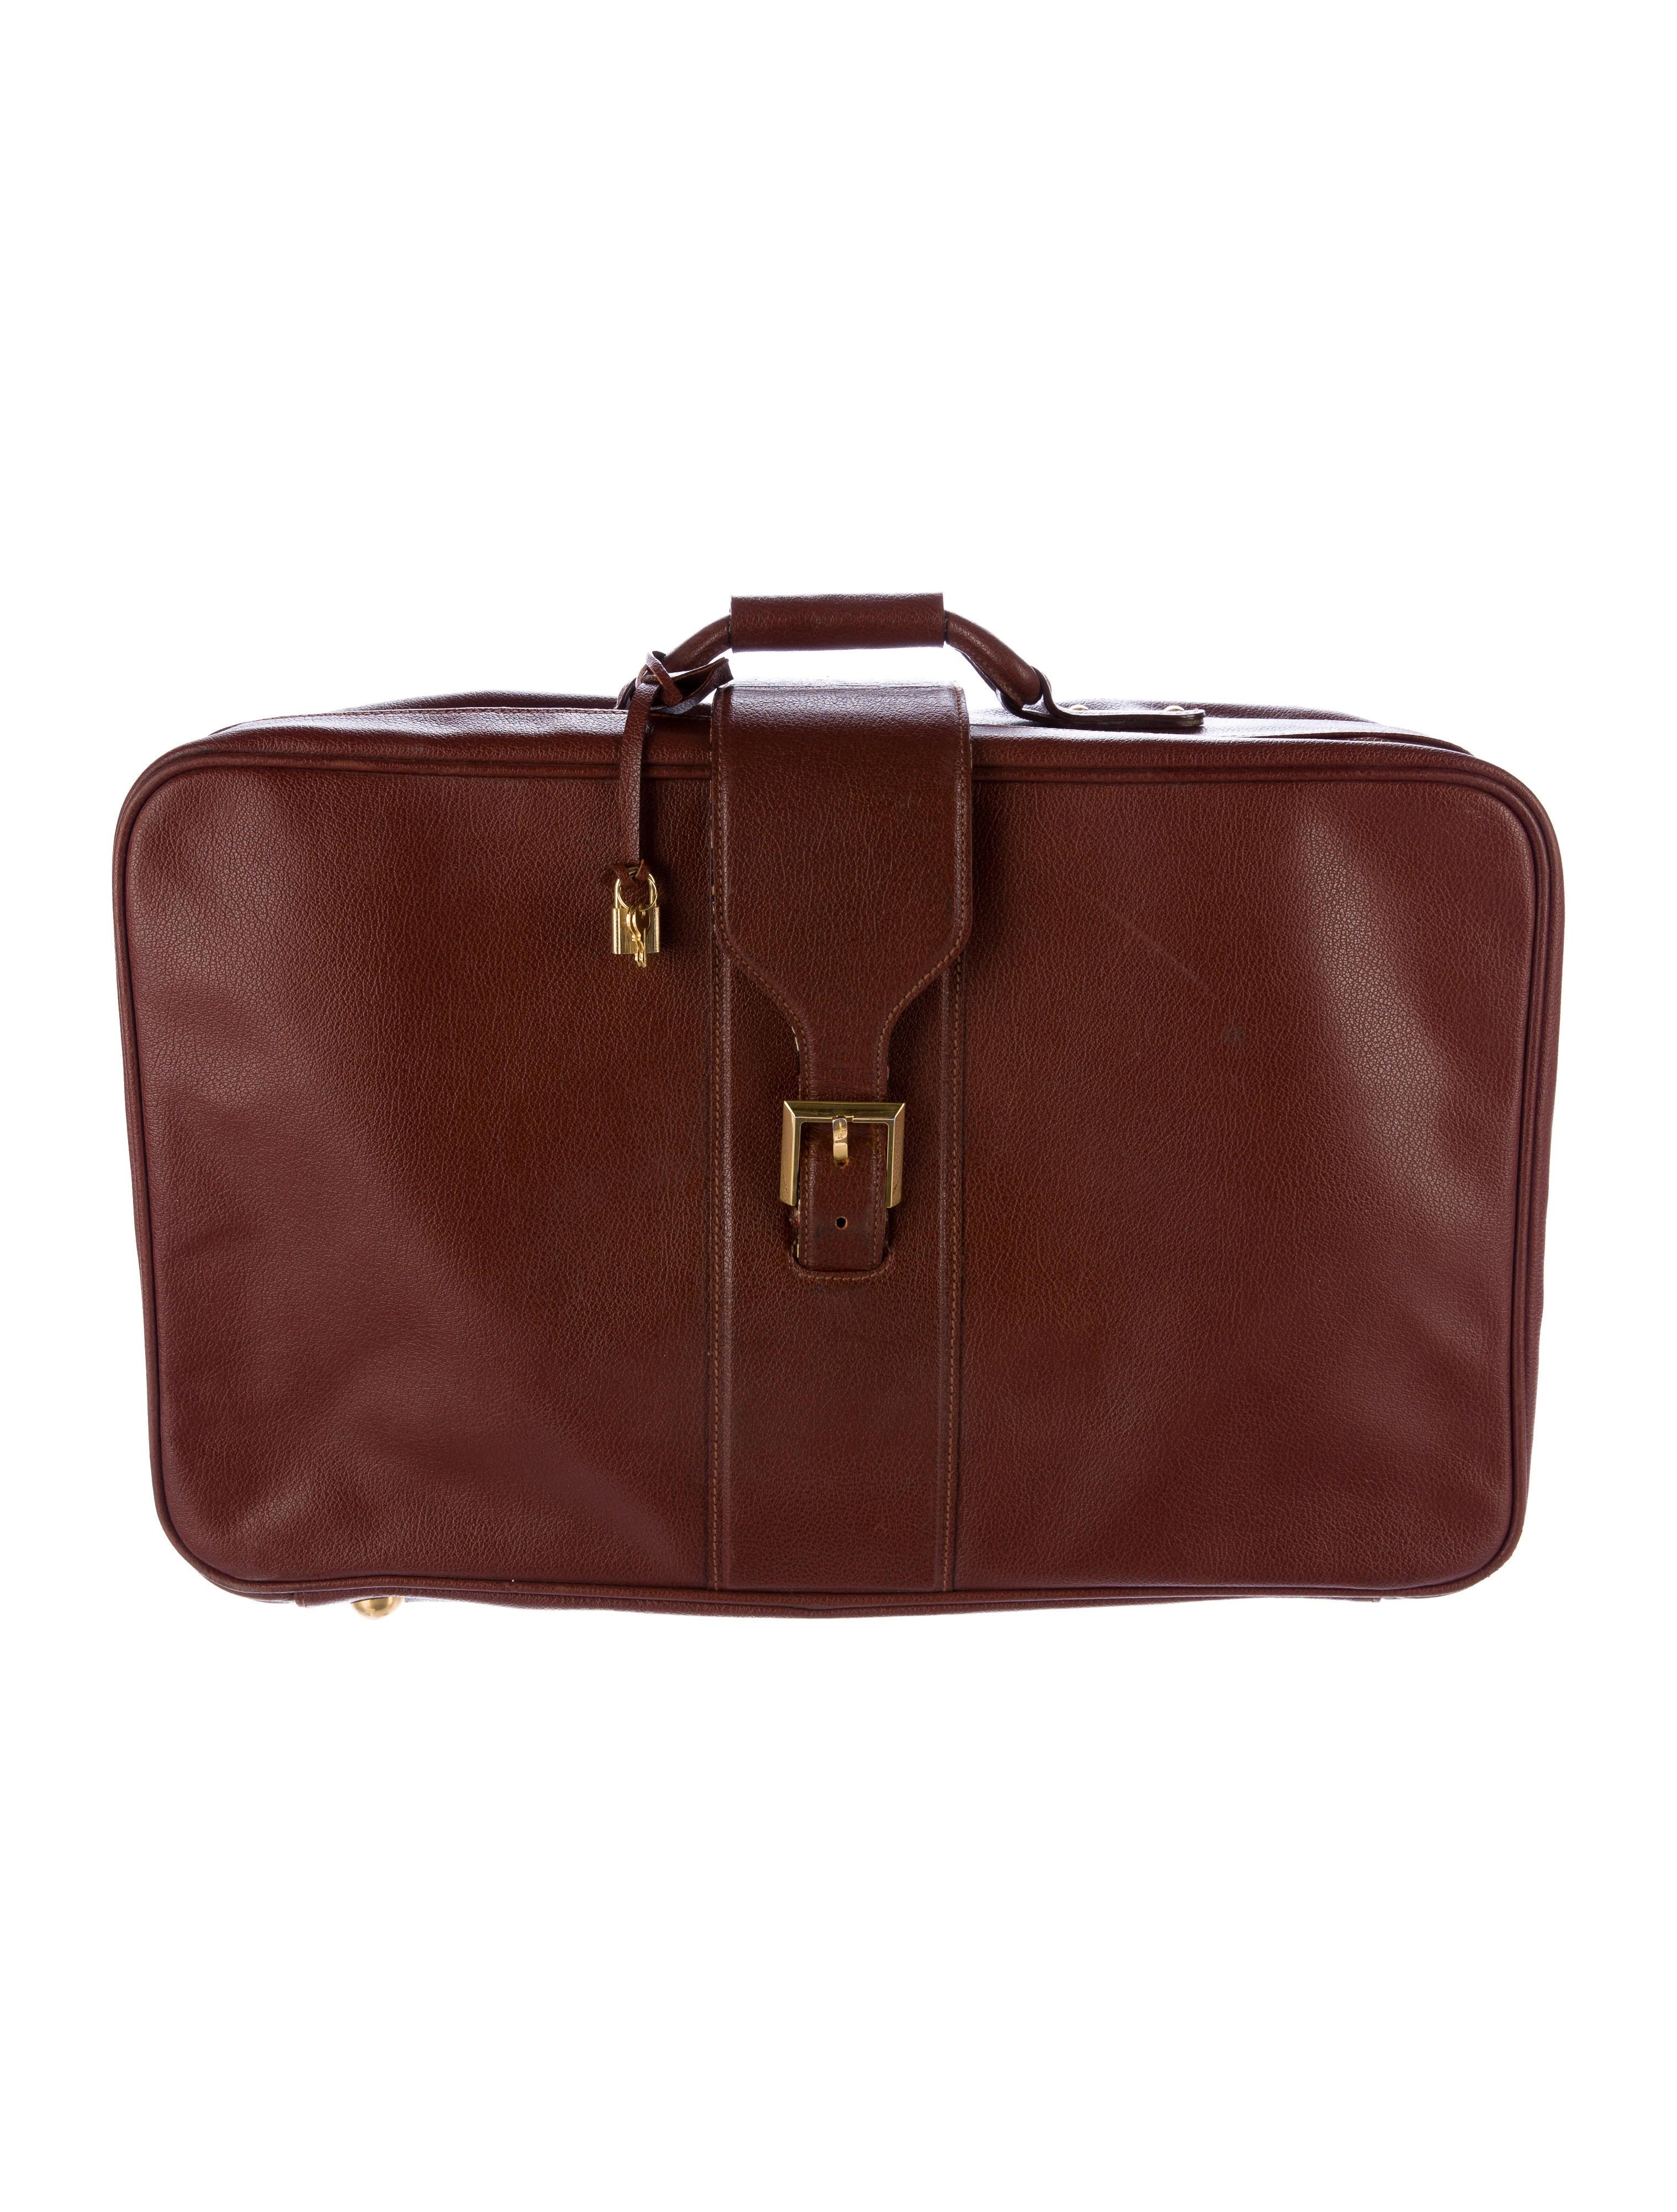 6c197b08e4 Salvatore Ferragamo Leather Travel Suitcase - Luggage - SAL48238 ...